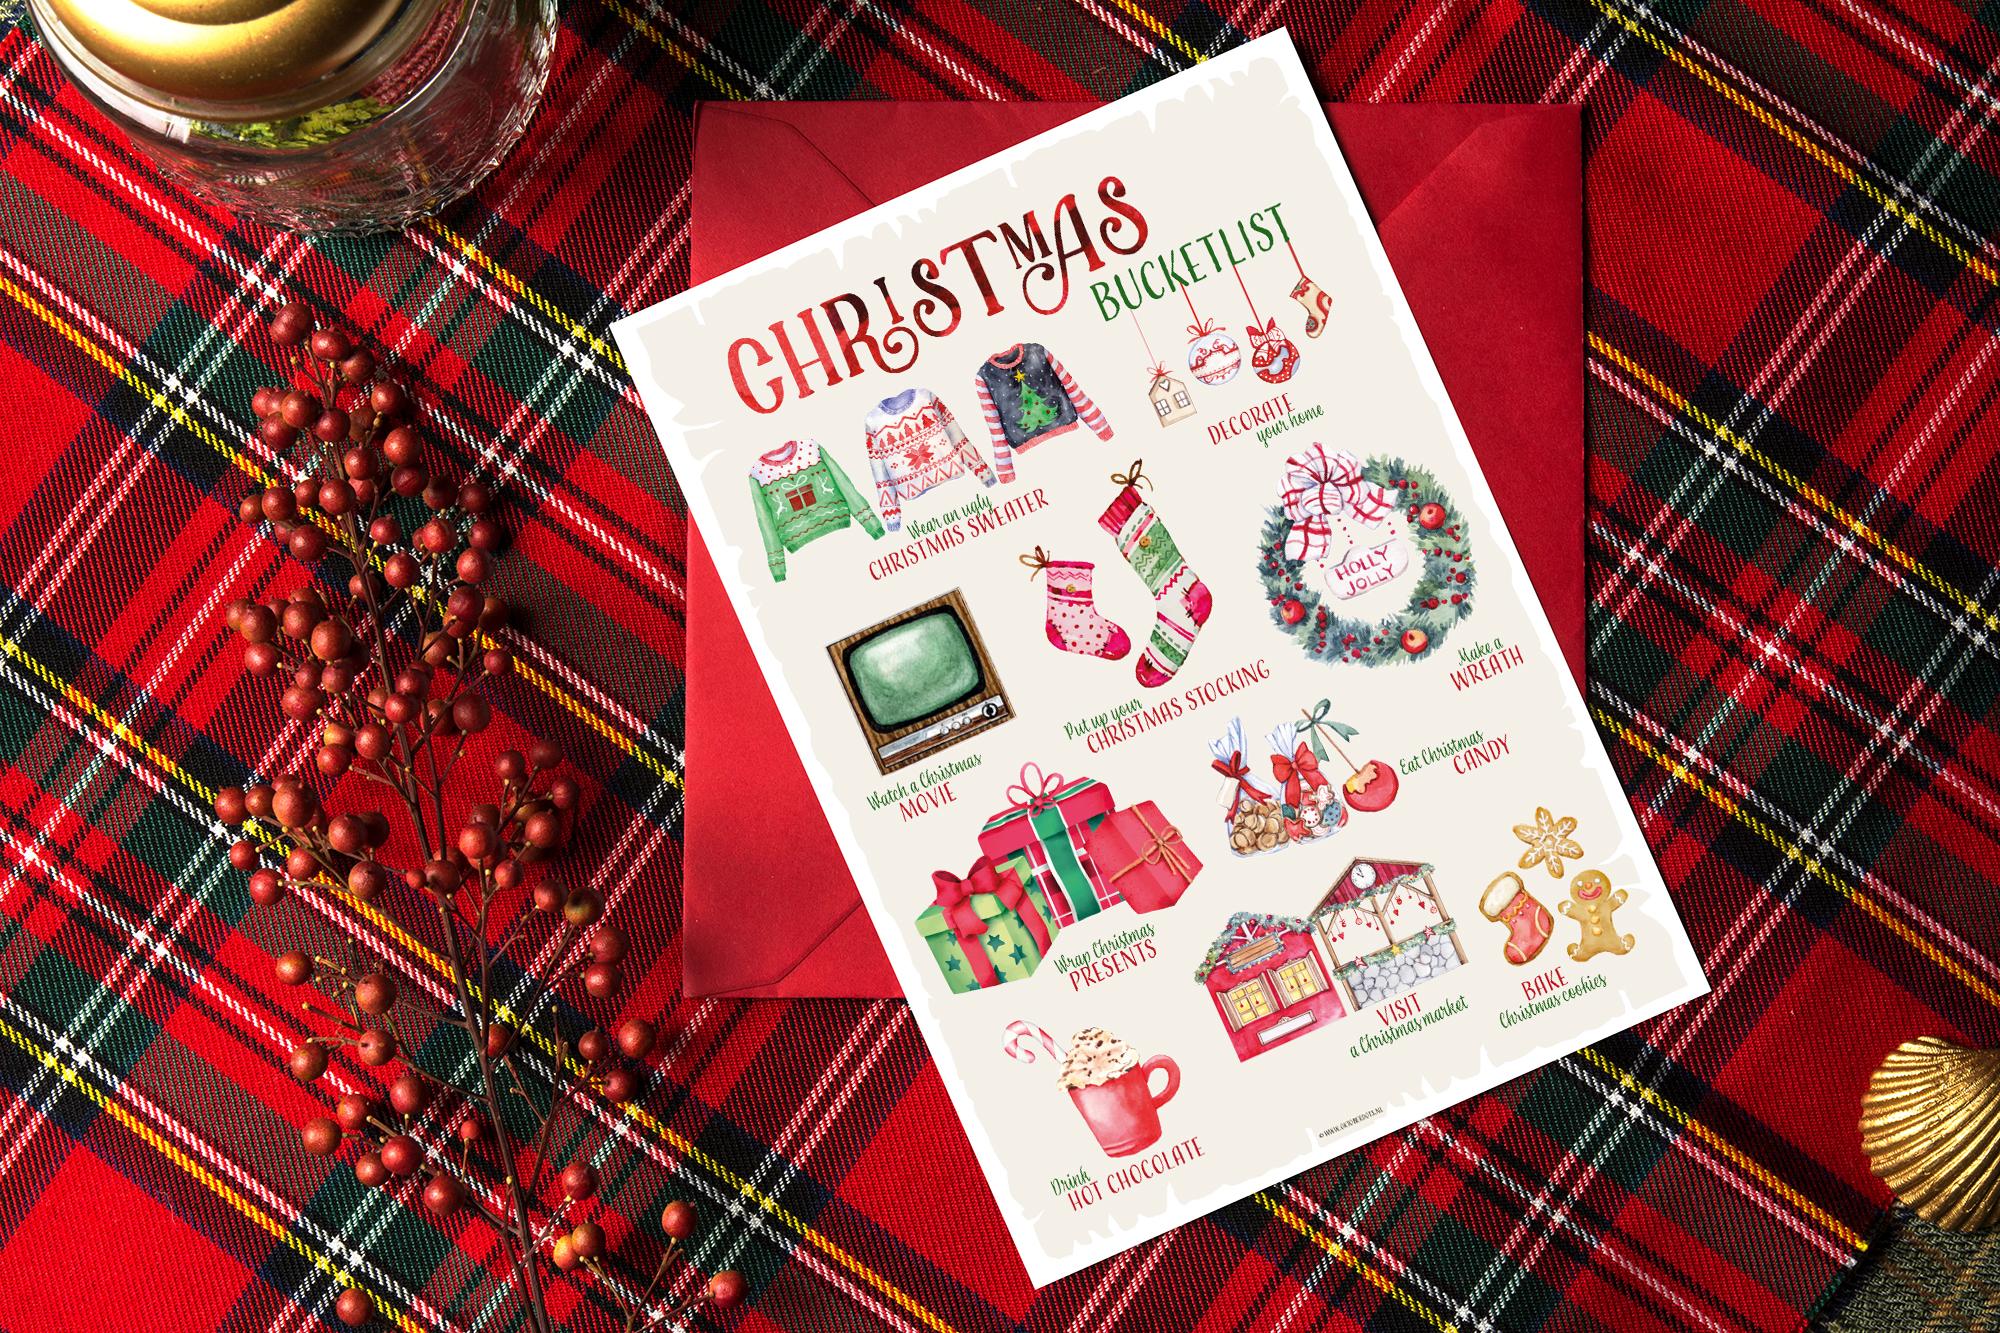 Oktoberdots Christmas bucketlist free printable